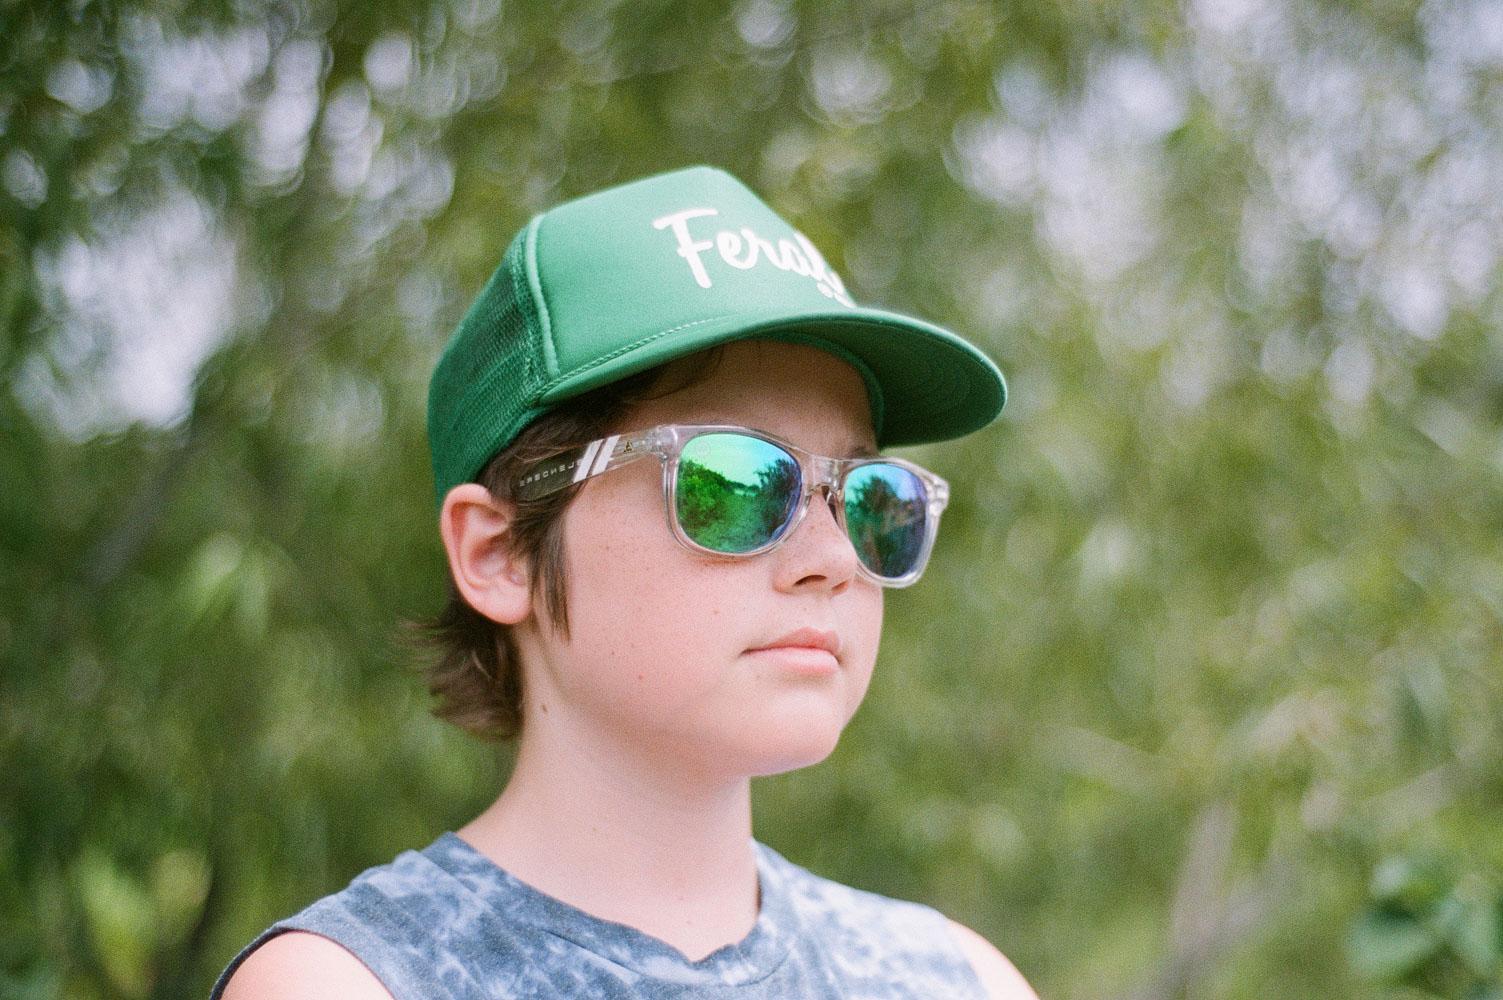 8.29.hamilton-creek-photography-daily-project-teenage-portraits-tampa-18-df8849f9